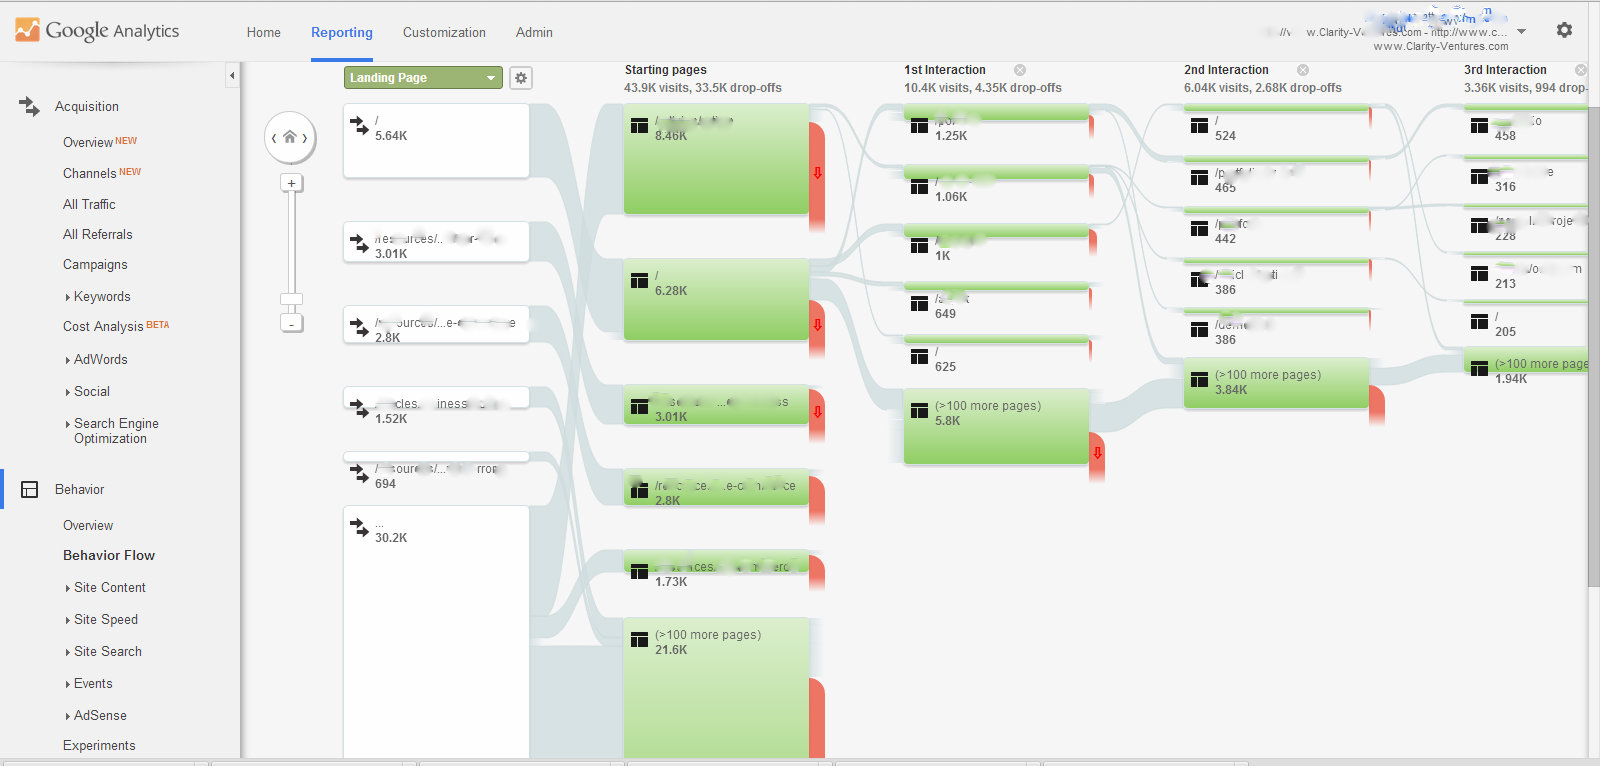 b2b CRM integration analytics behavior flow | Clarity